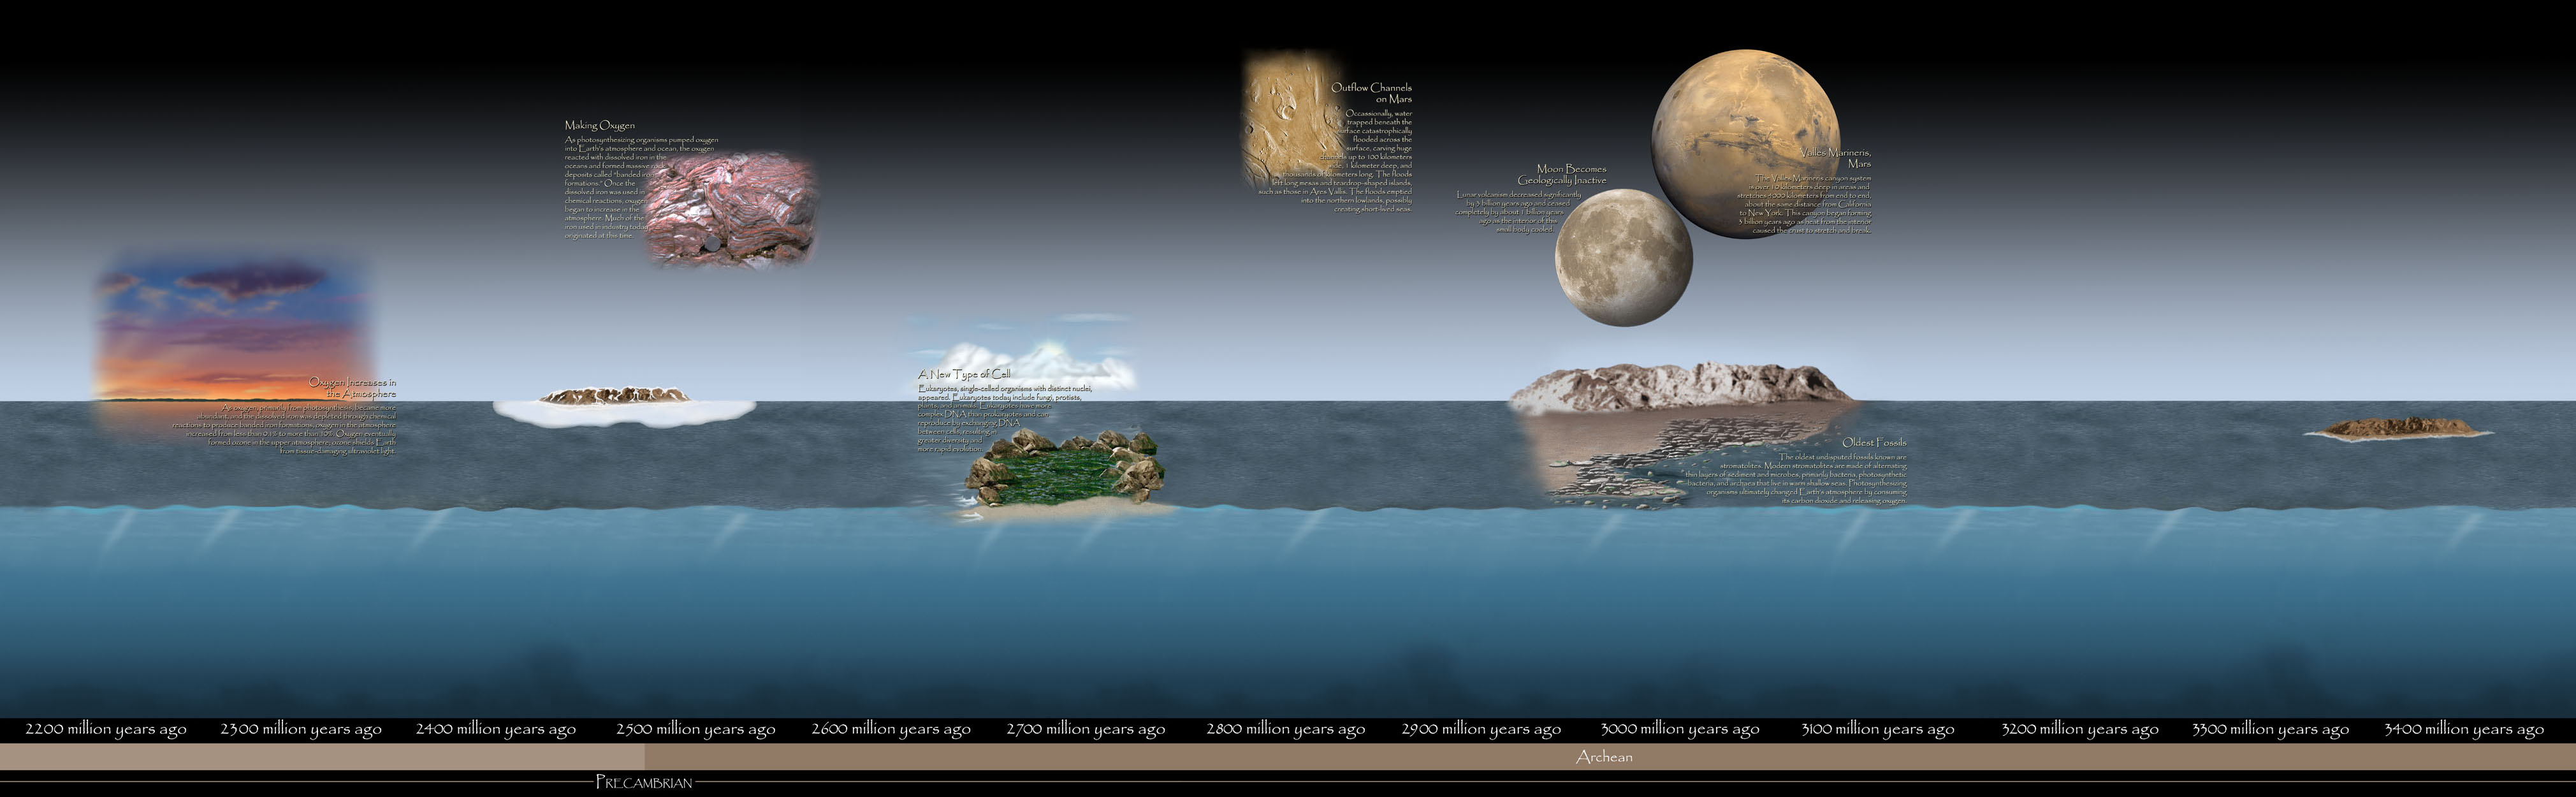 history-of-earth